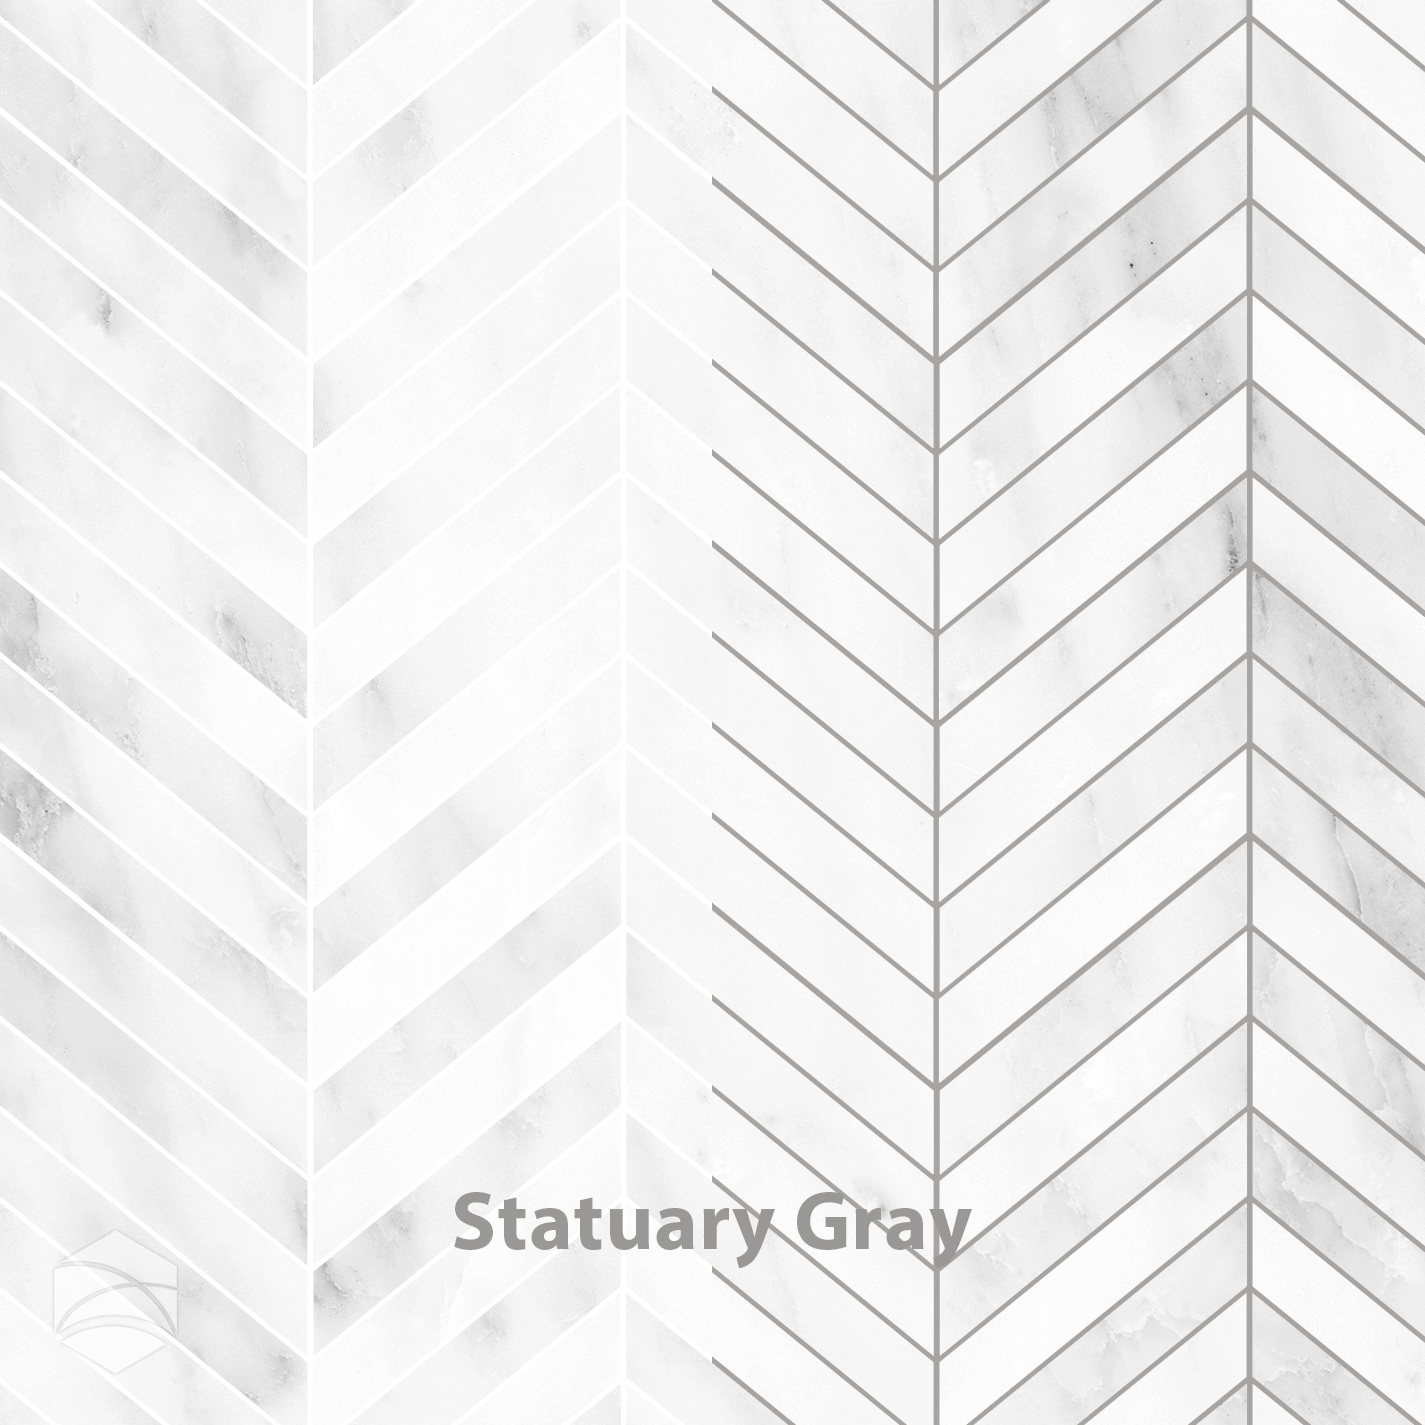 Statuary Gray_Chevron_V2_14x14.jpg